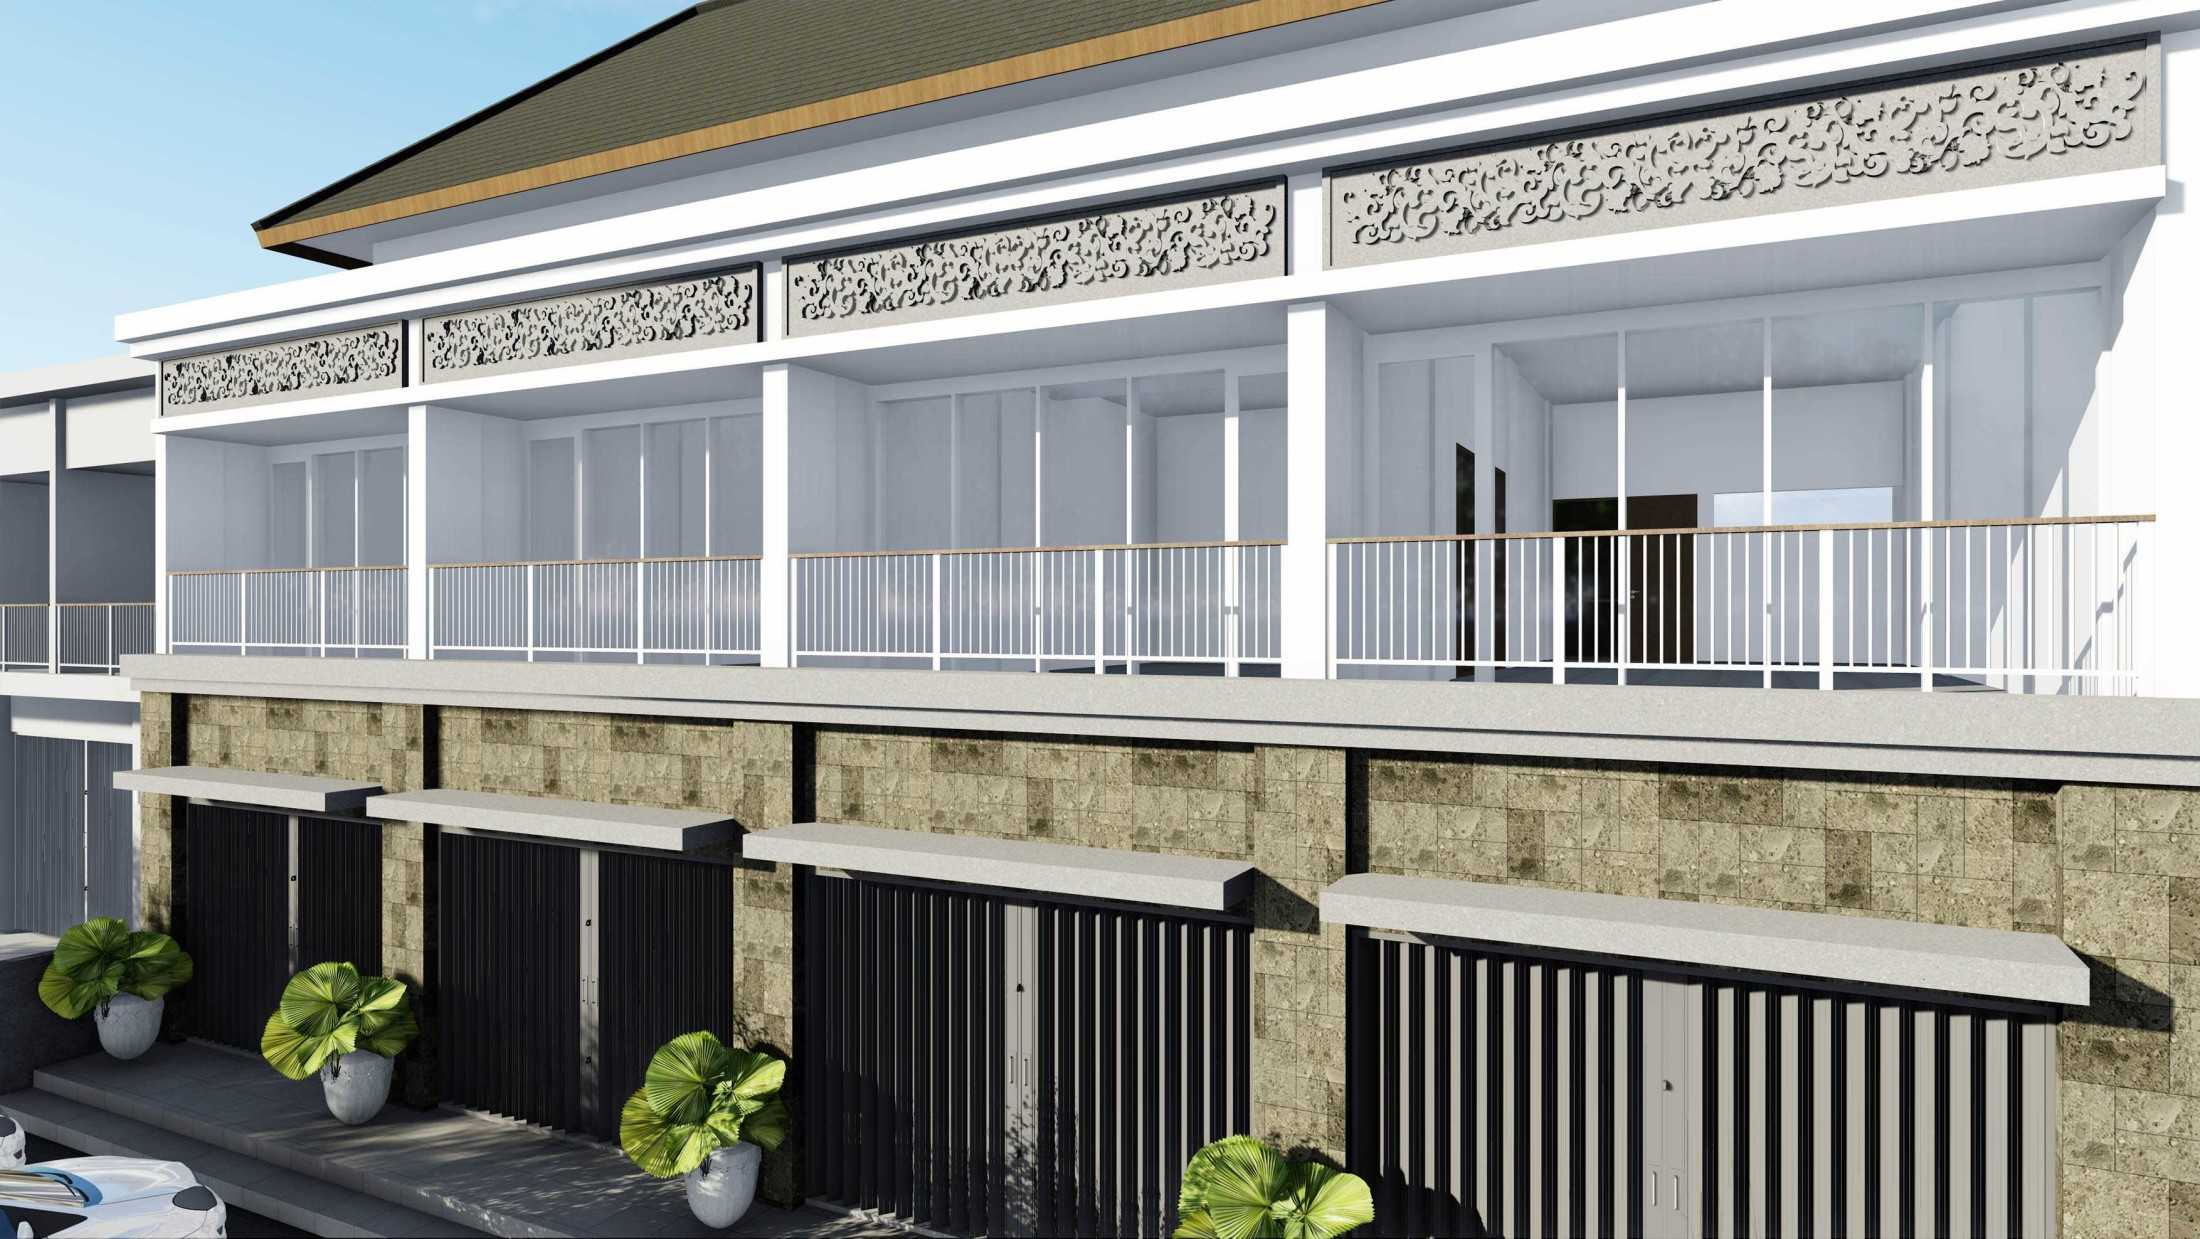 Revan Teggar Shop House & Room Apartment Kota Denpasar, Bali, Indonesia Kota Denpasar, Bali, Indonesia Revan-Teggar-Shop-House-Room-Apartment  124036